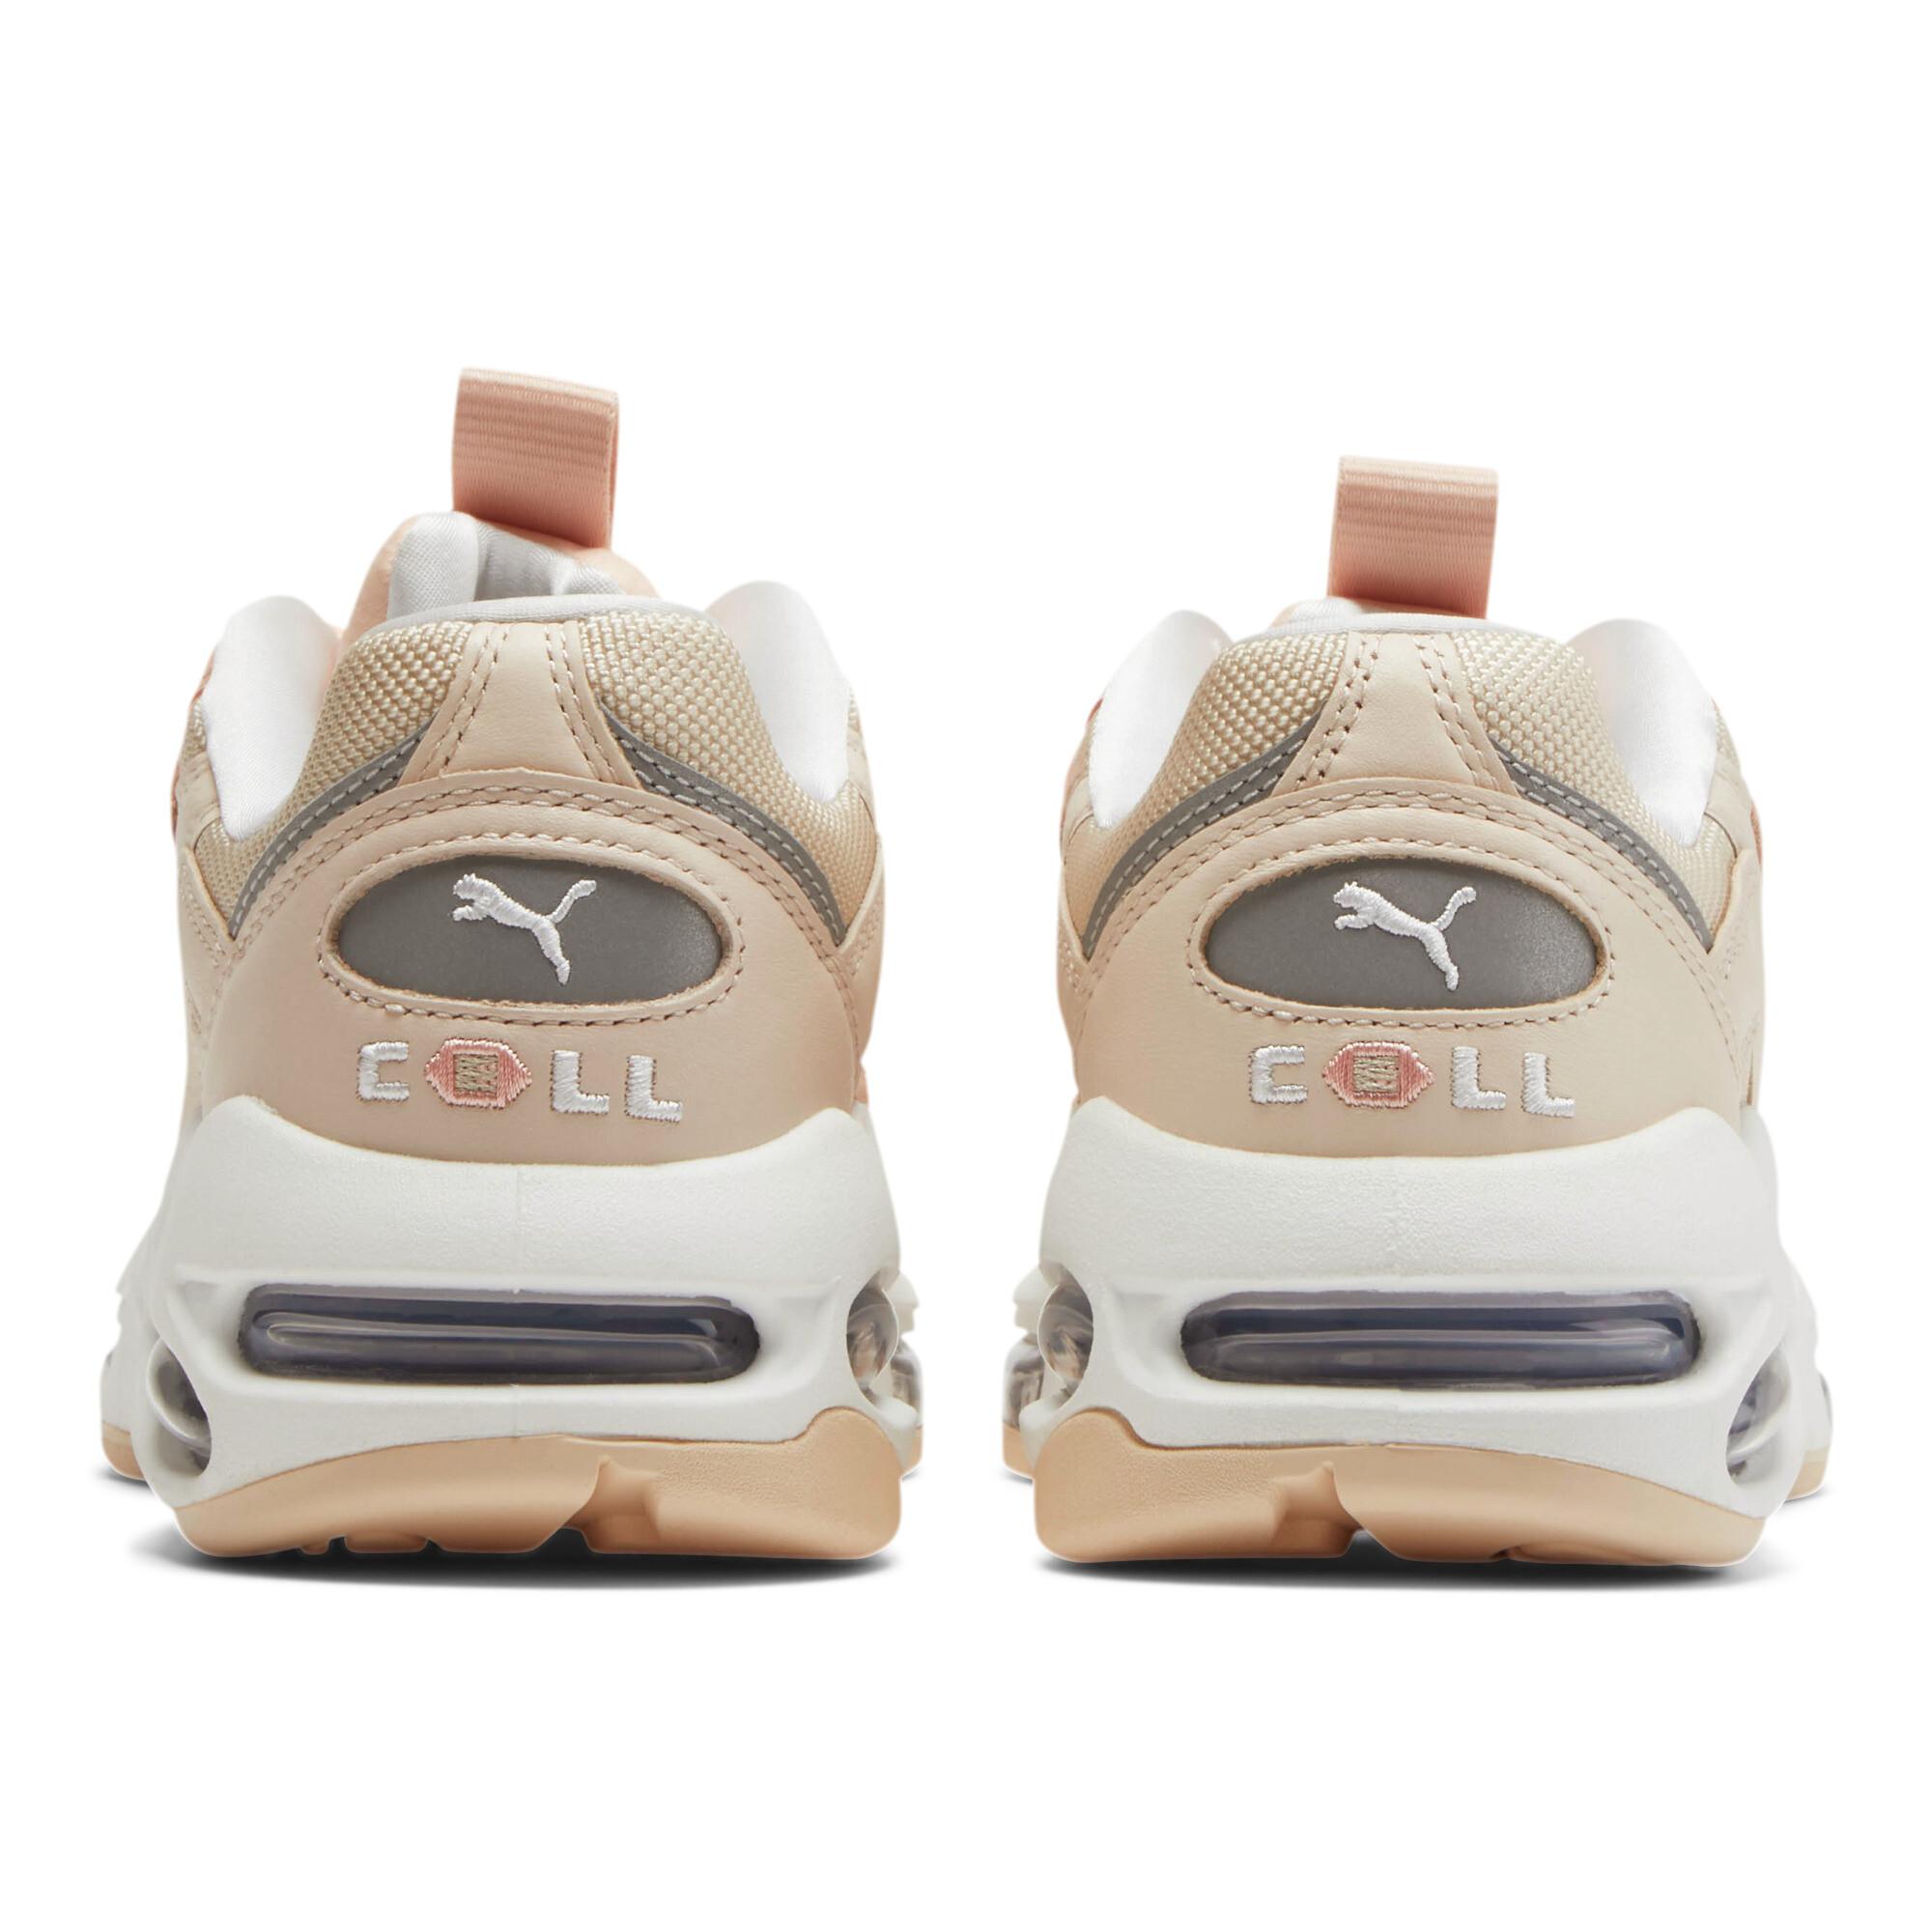 PUMA-CELL-Endura-Rebound-Women-039-s-Sneakers-Women-Shoe-Sport-Classics thumbnail 9